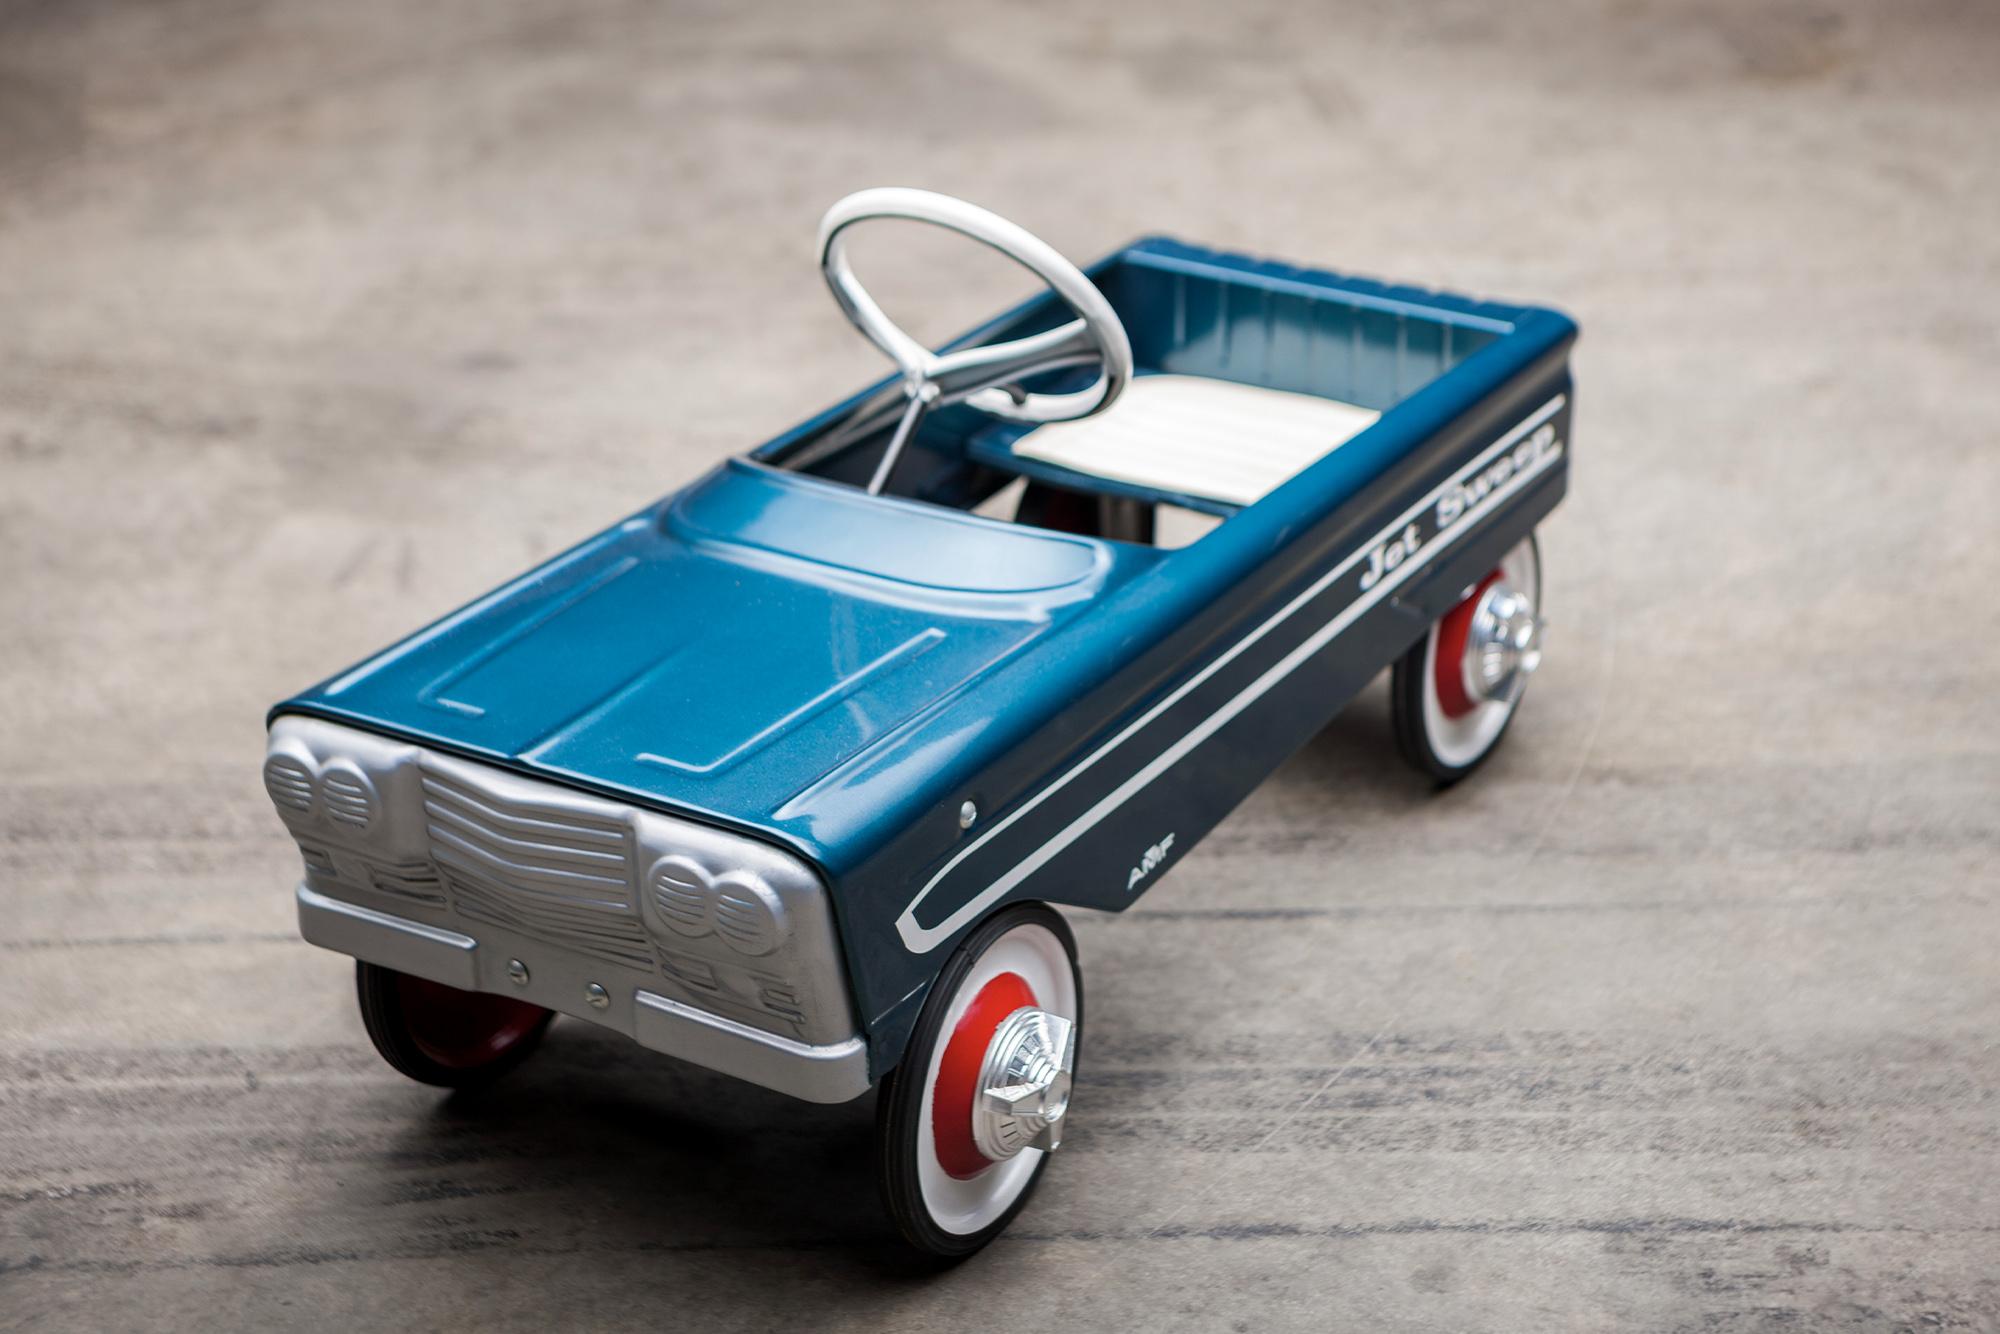 Jet Sweep pedal car